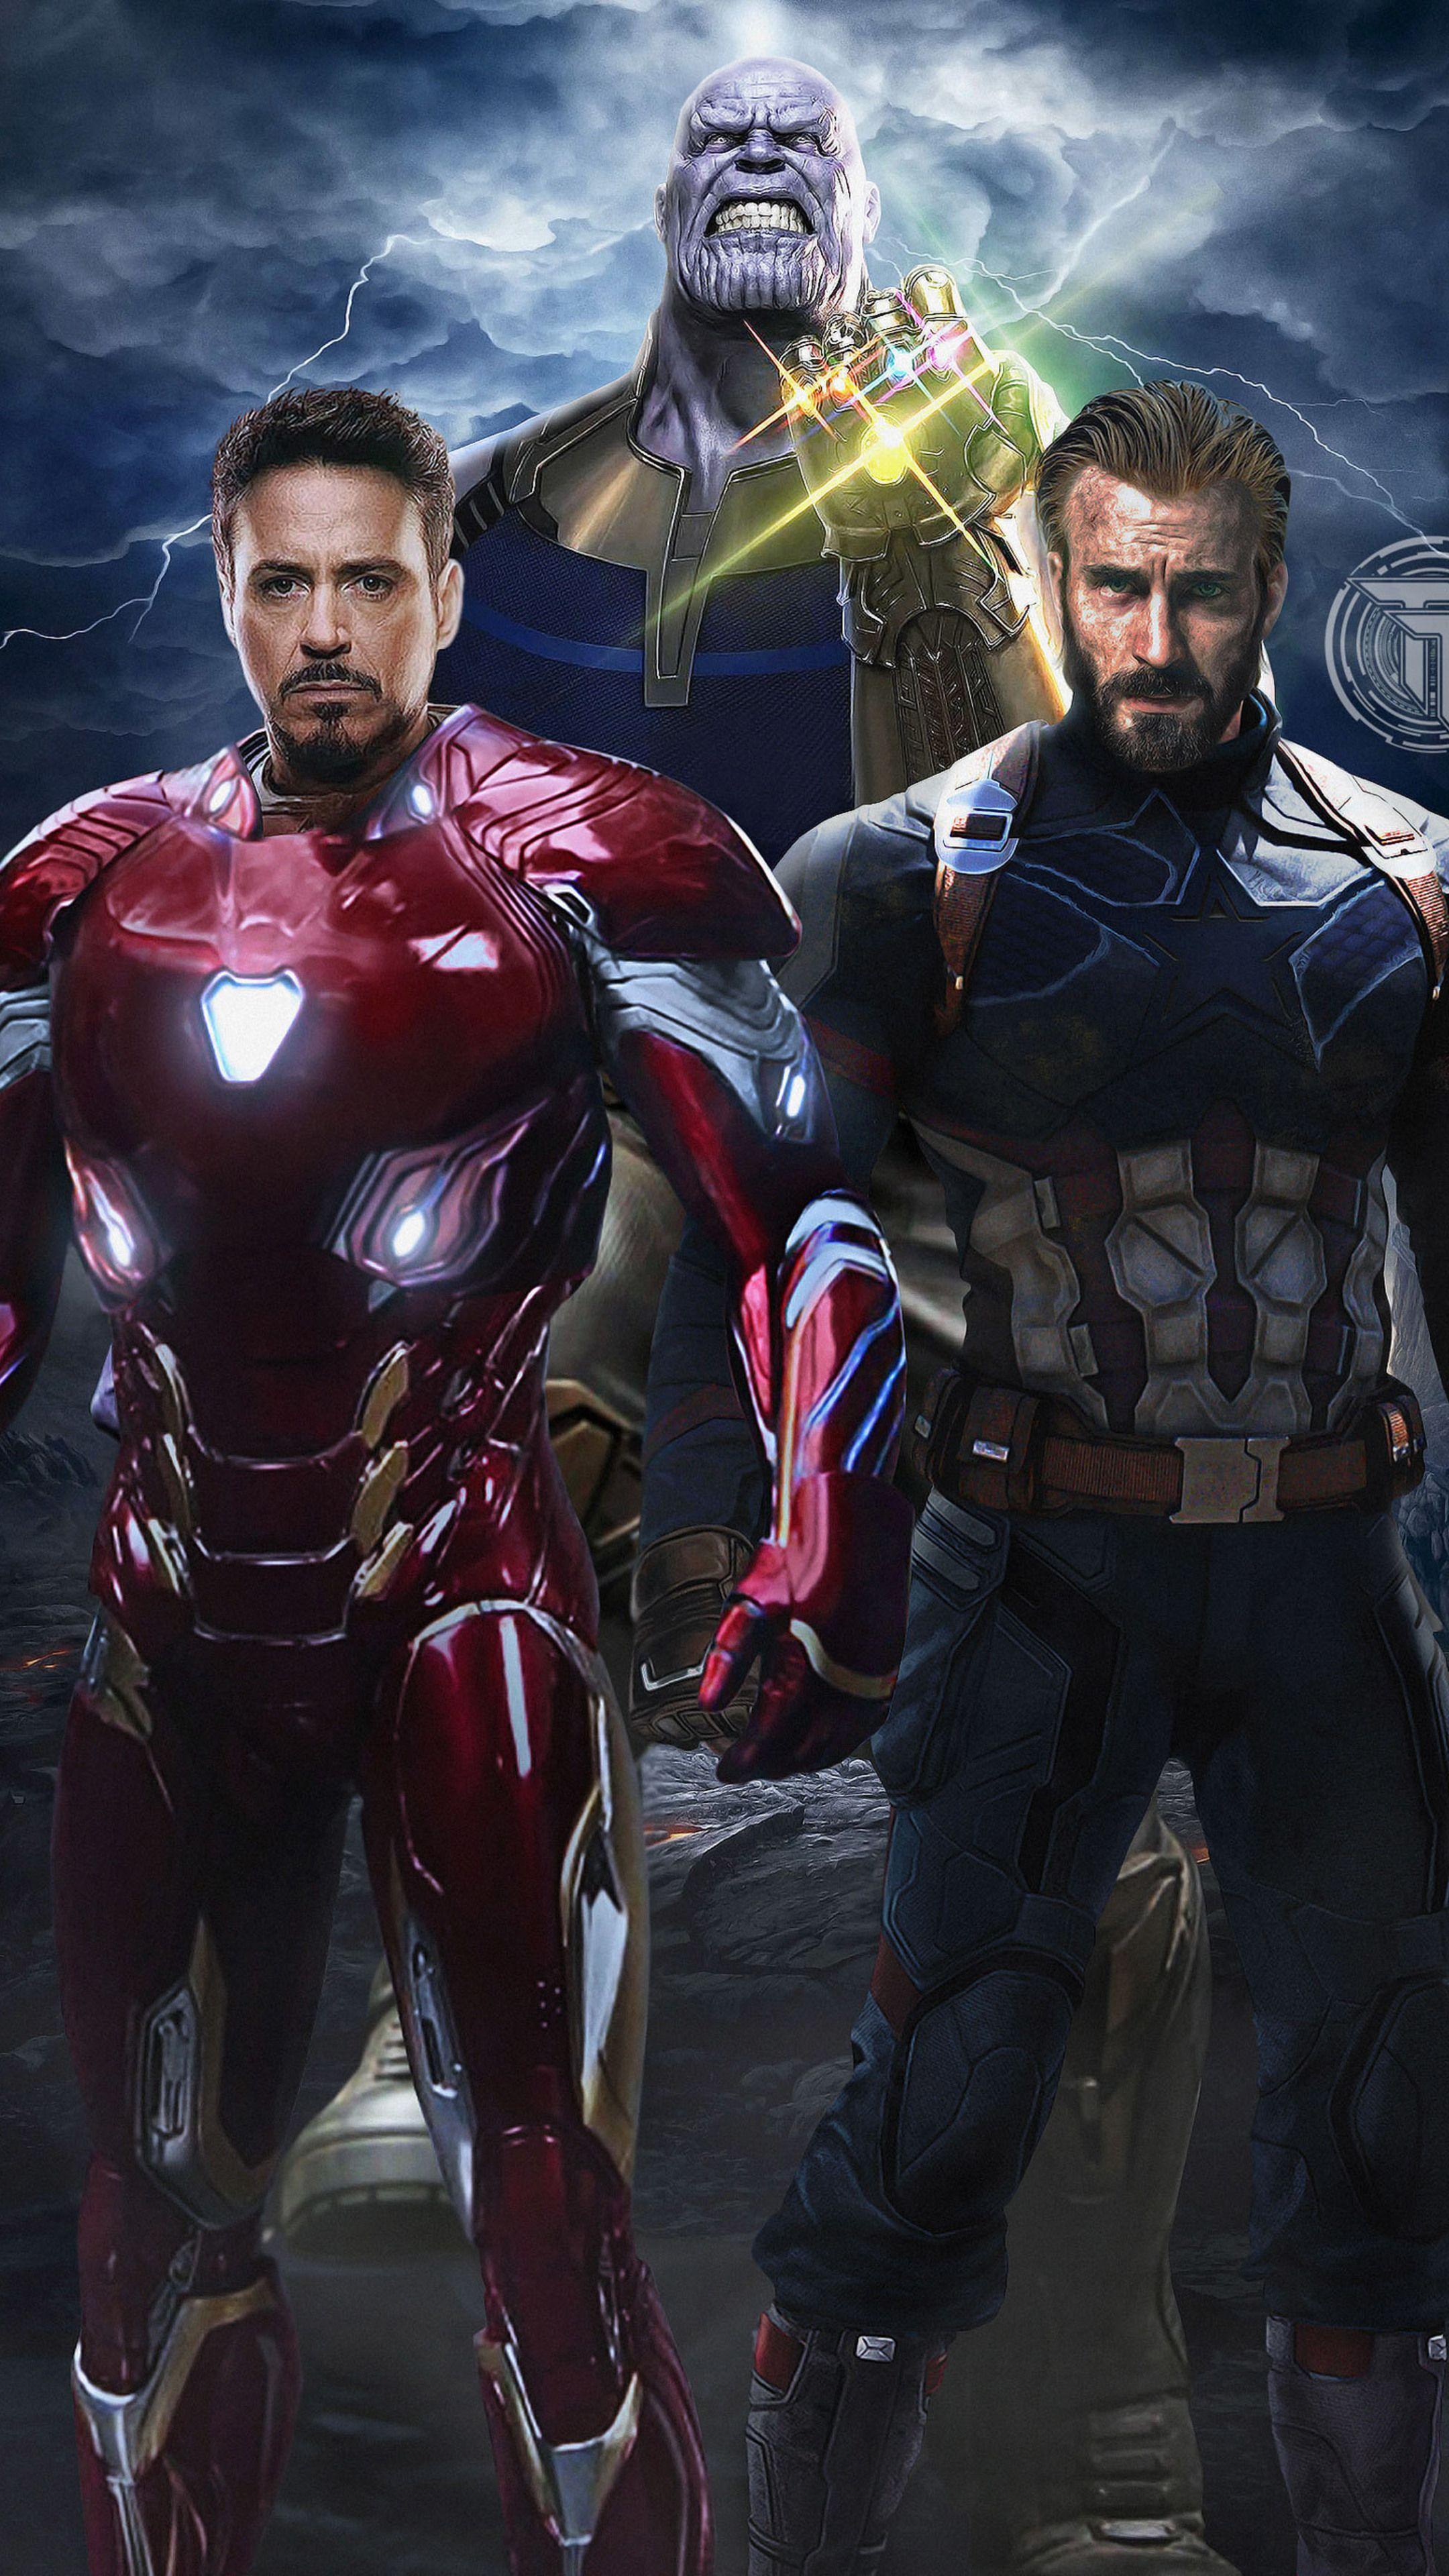 Avengers Desktop Wallpapers on